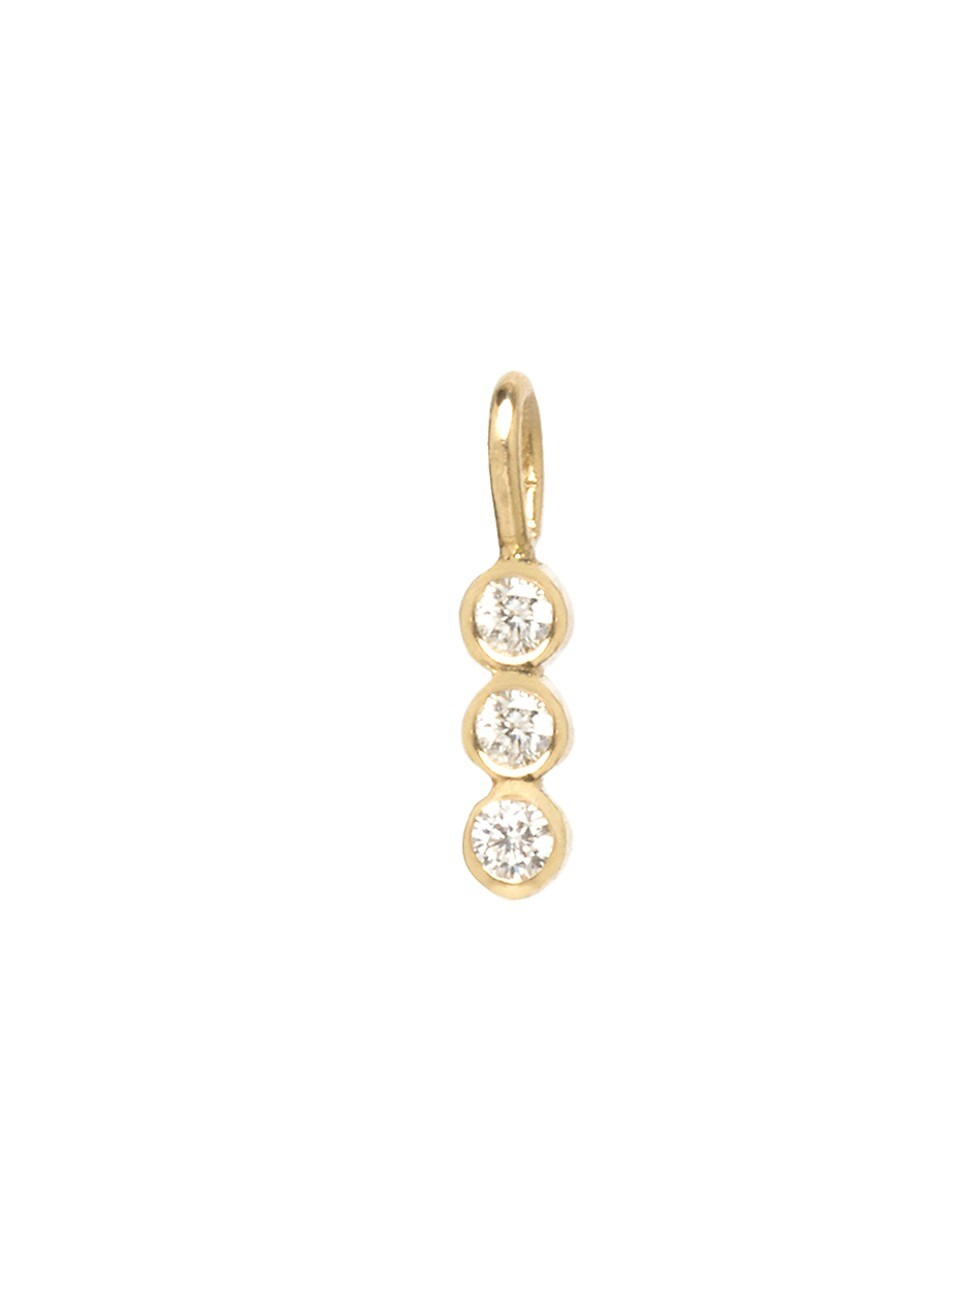 Zoë Chicco Women's 14k Yellow Gold & White Diamond 3 Vertical Charm Pendant